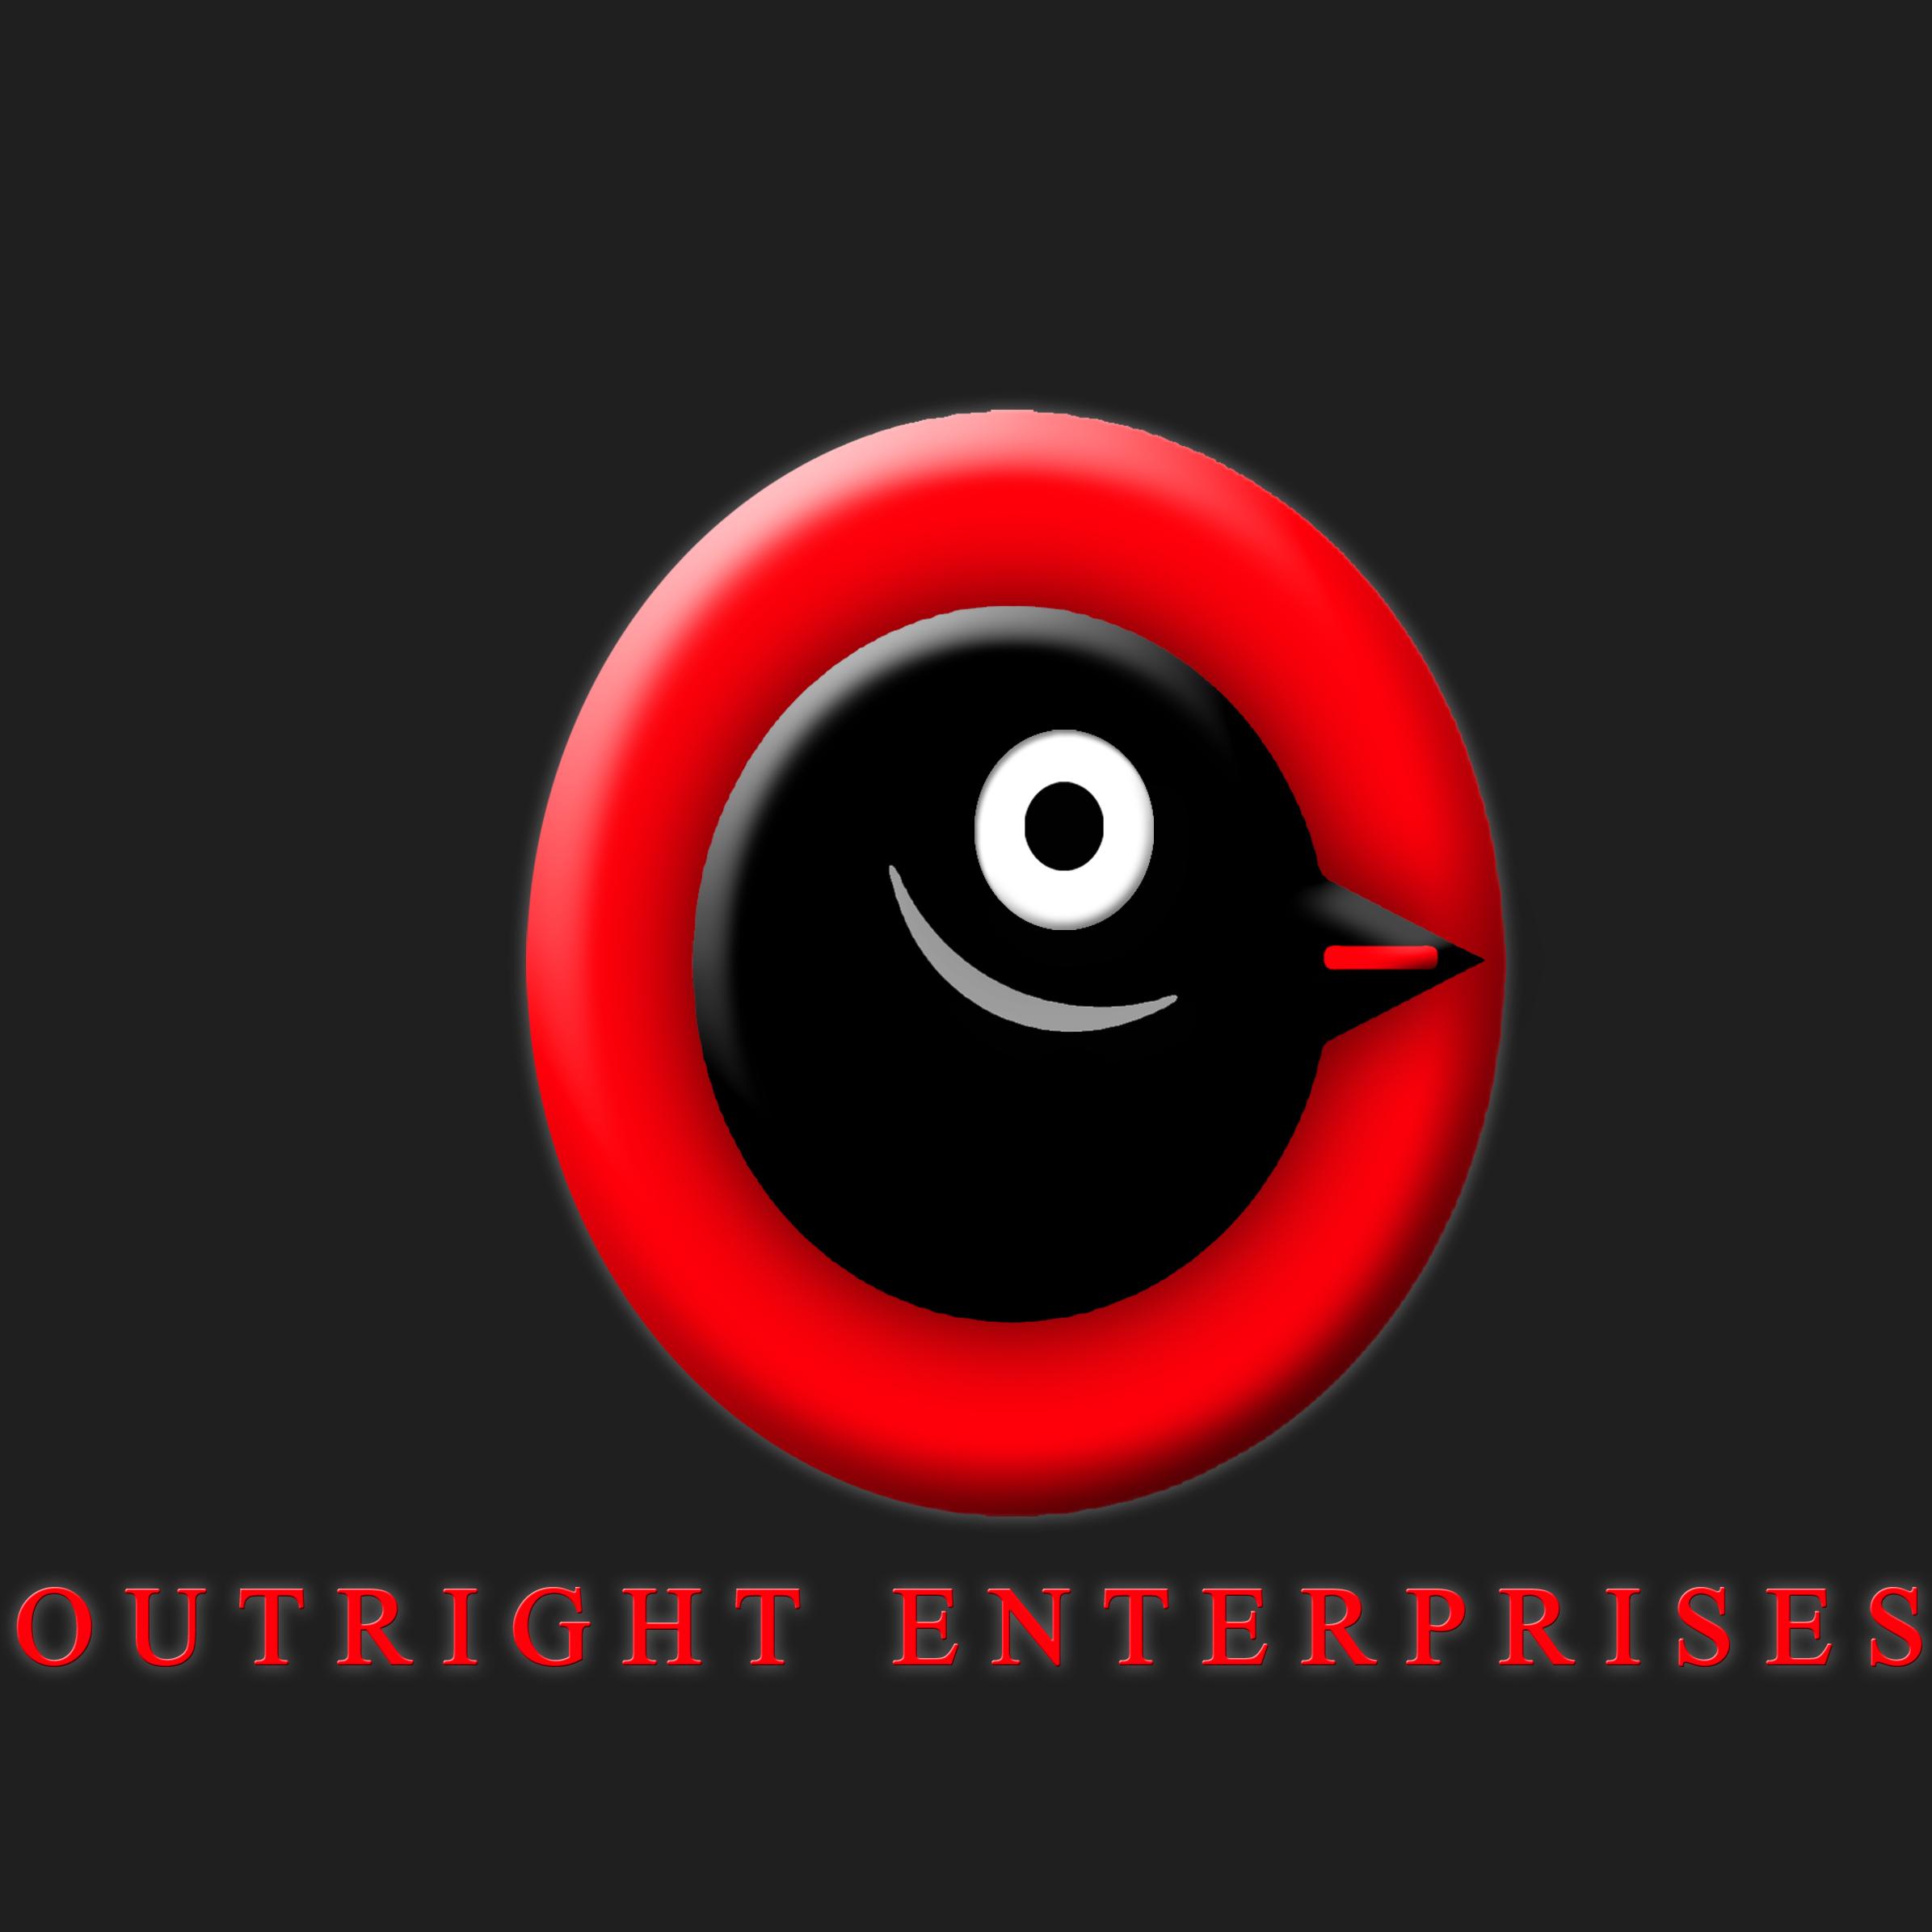 outrightenterprises